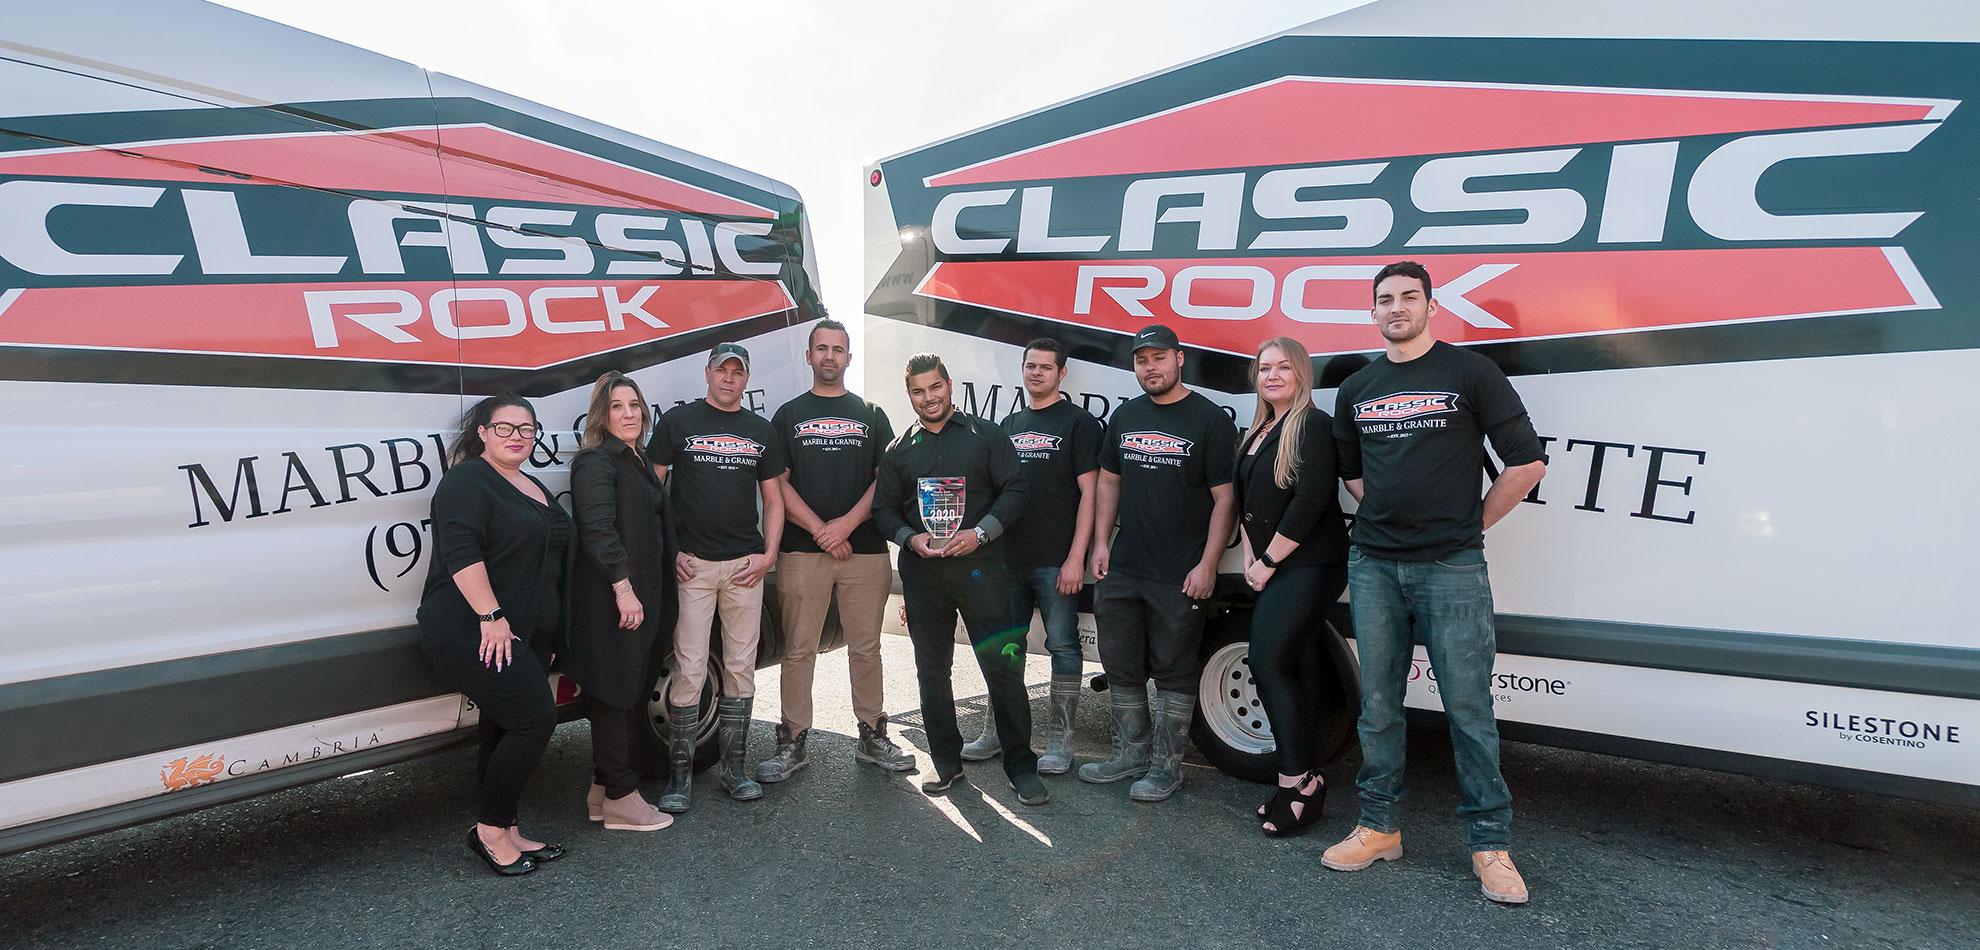 Classic Rock Team